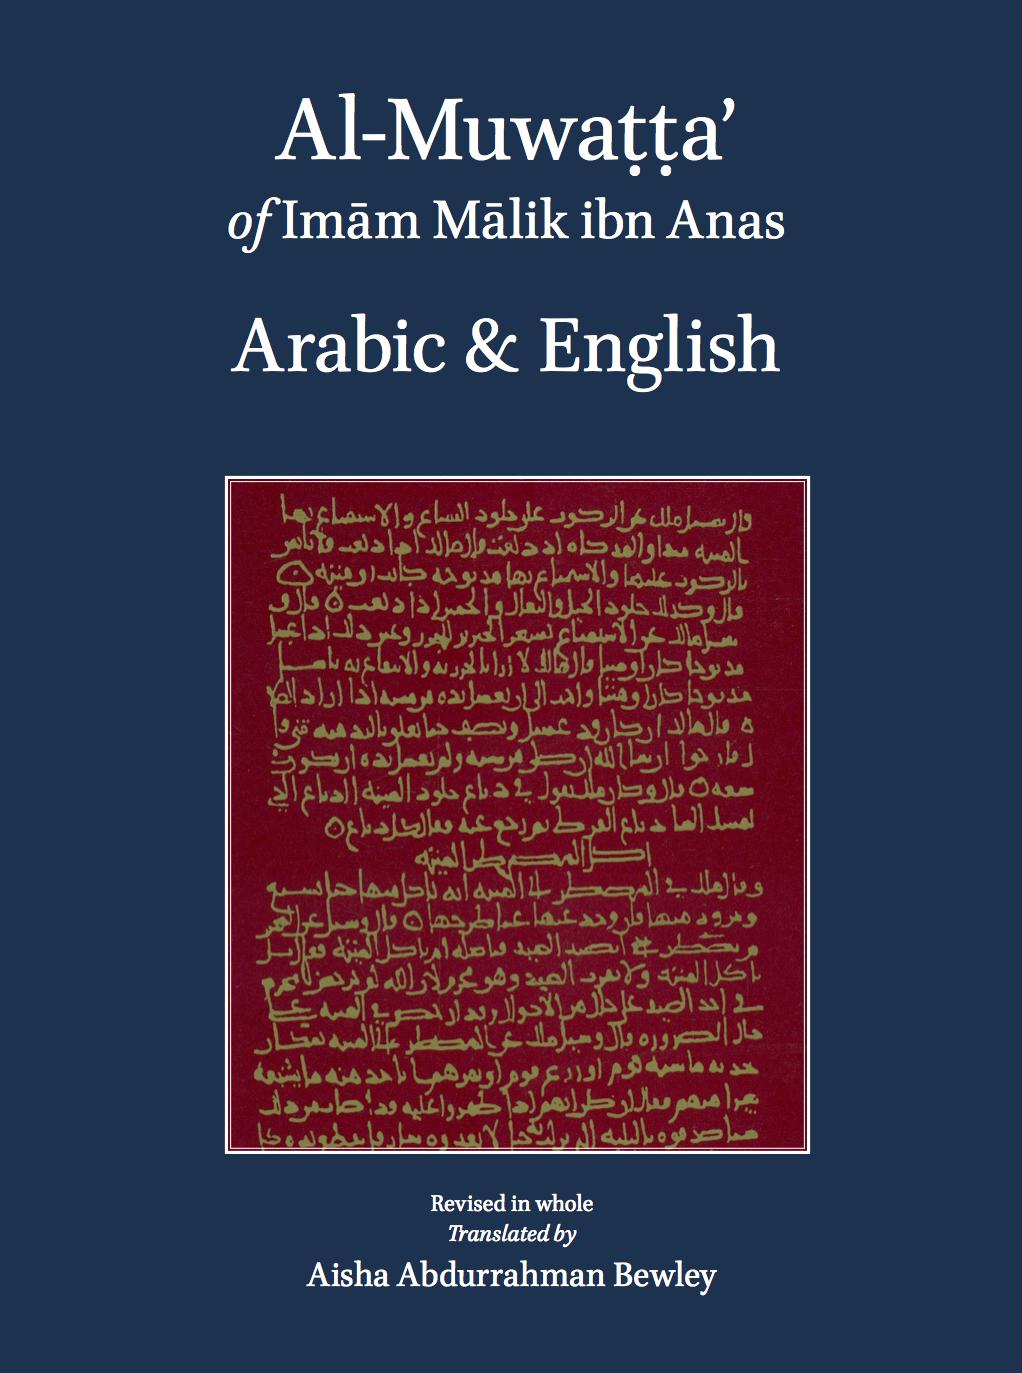 Diwan press al muwatta imam malik ibn anas arabic english al muwatta imam malik ibn anas arabic english malvernweather Gallery